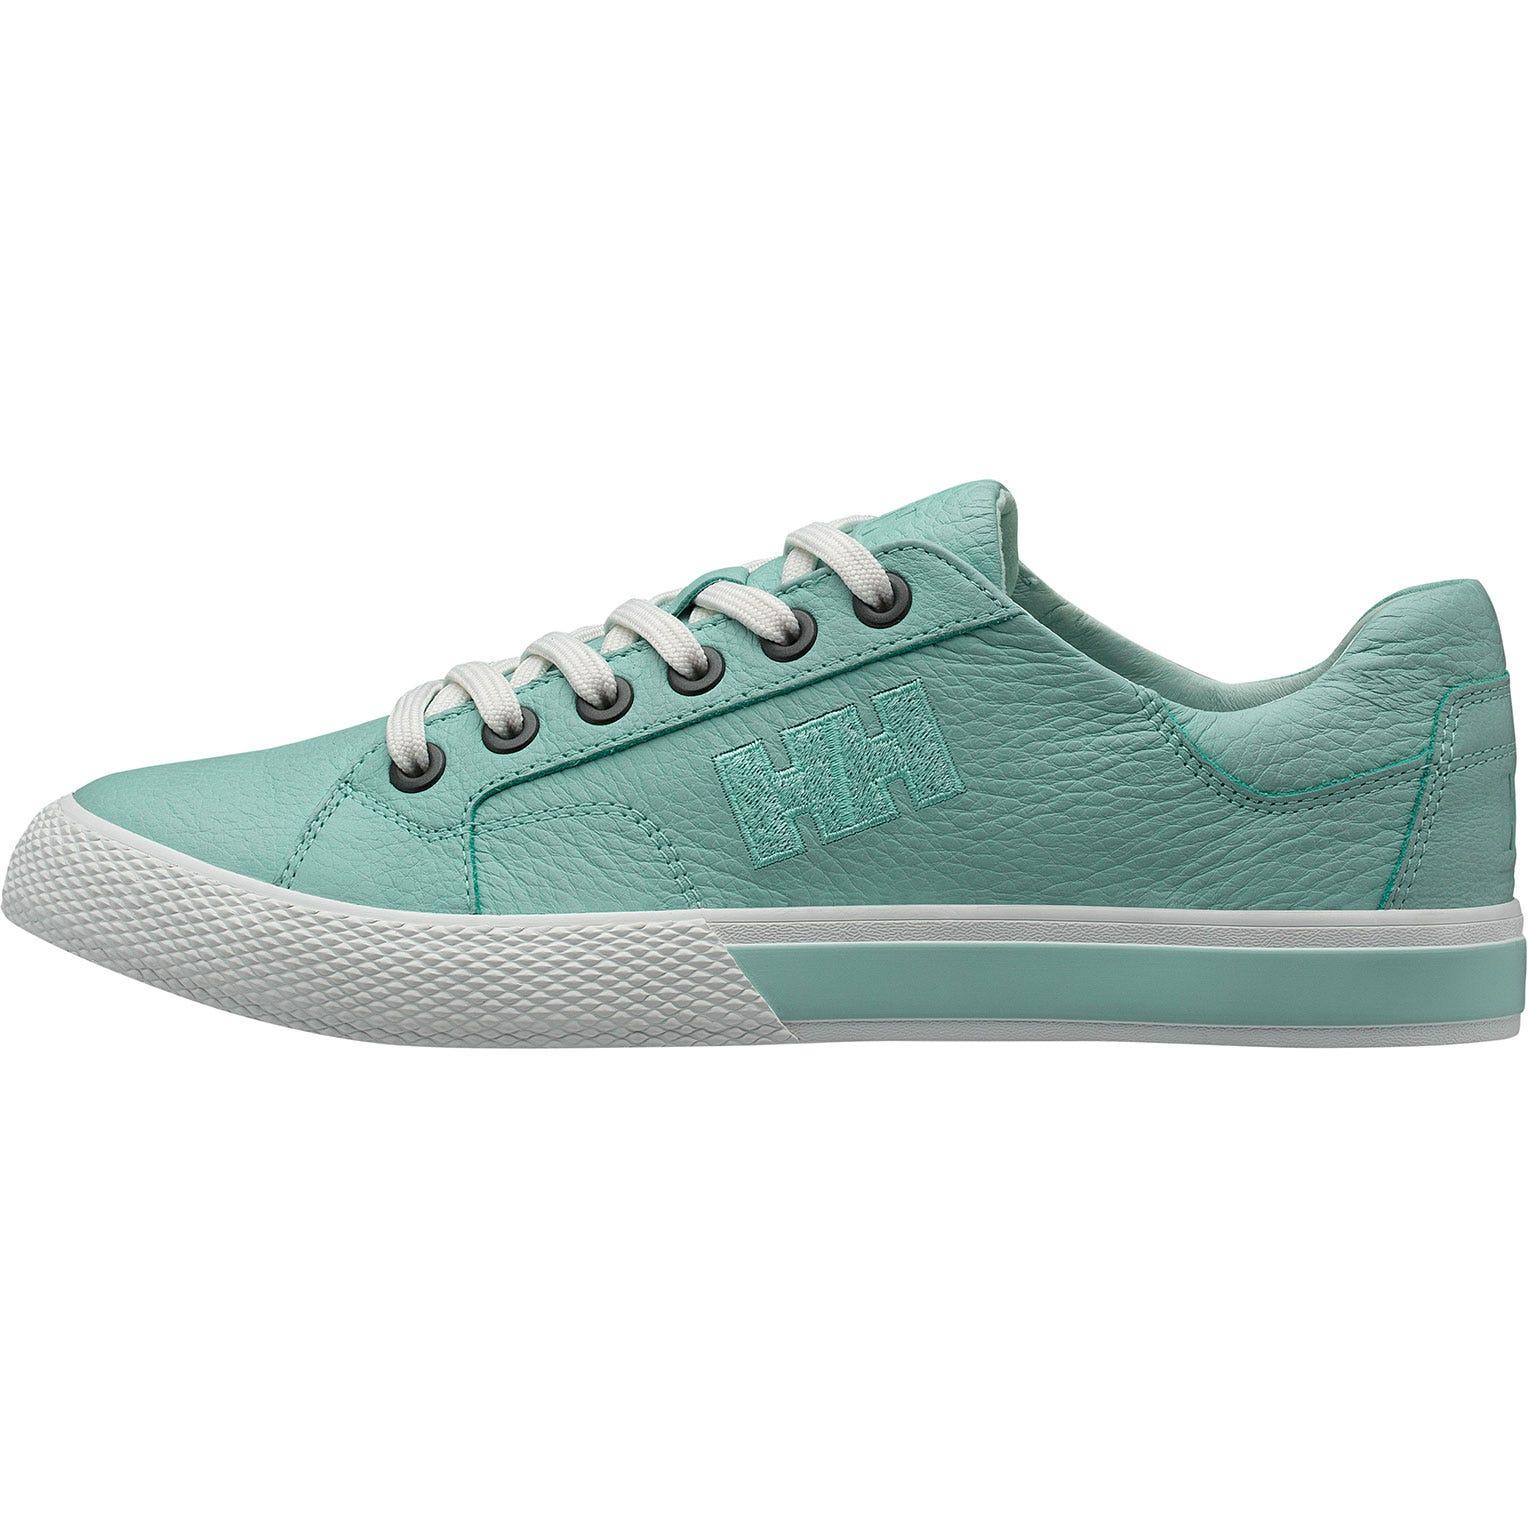 Helly Hansen W Fjord Lv2 Womens Casual Shoe Blue 36/5.5